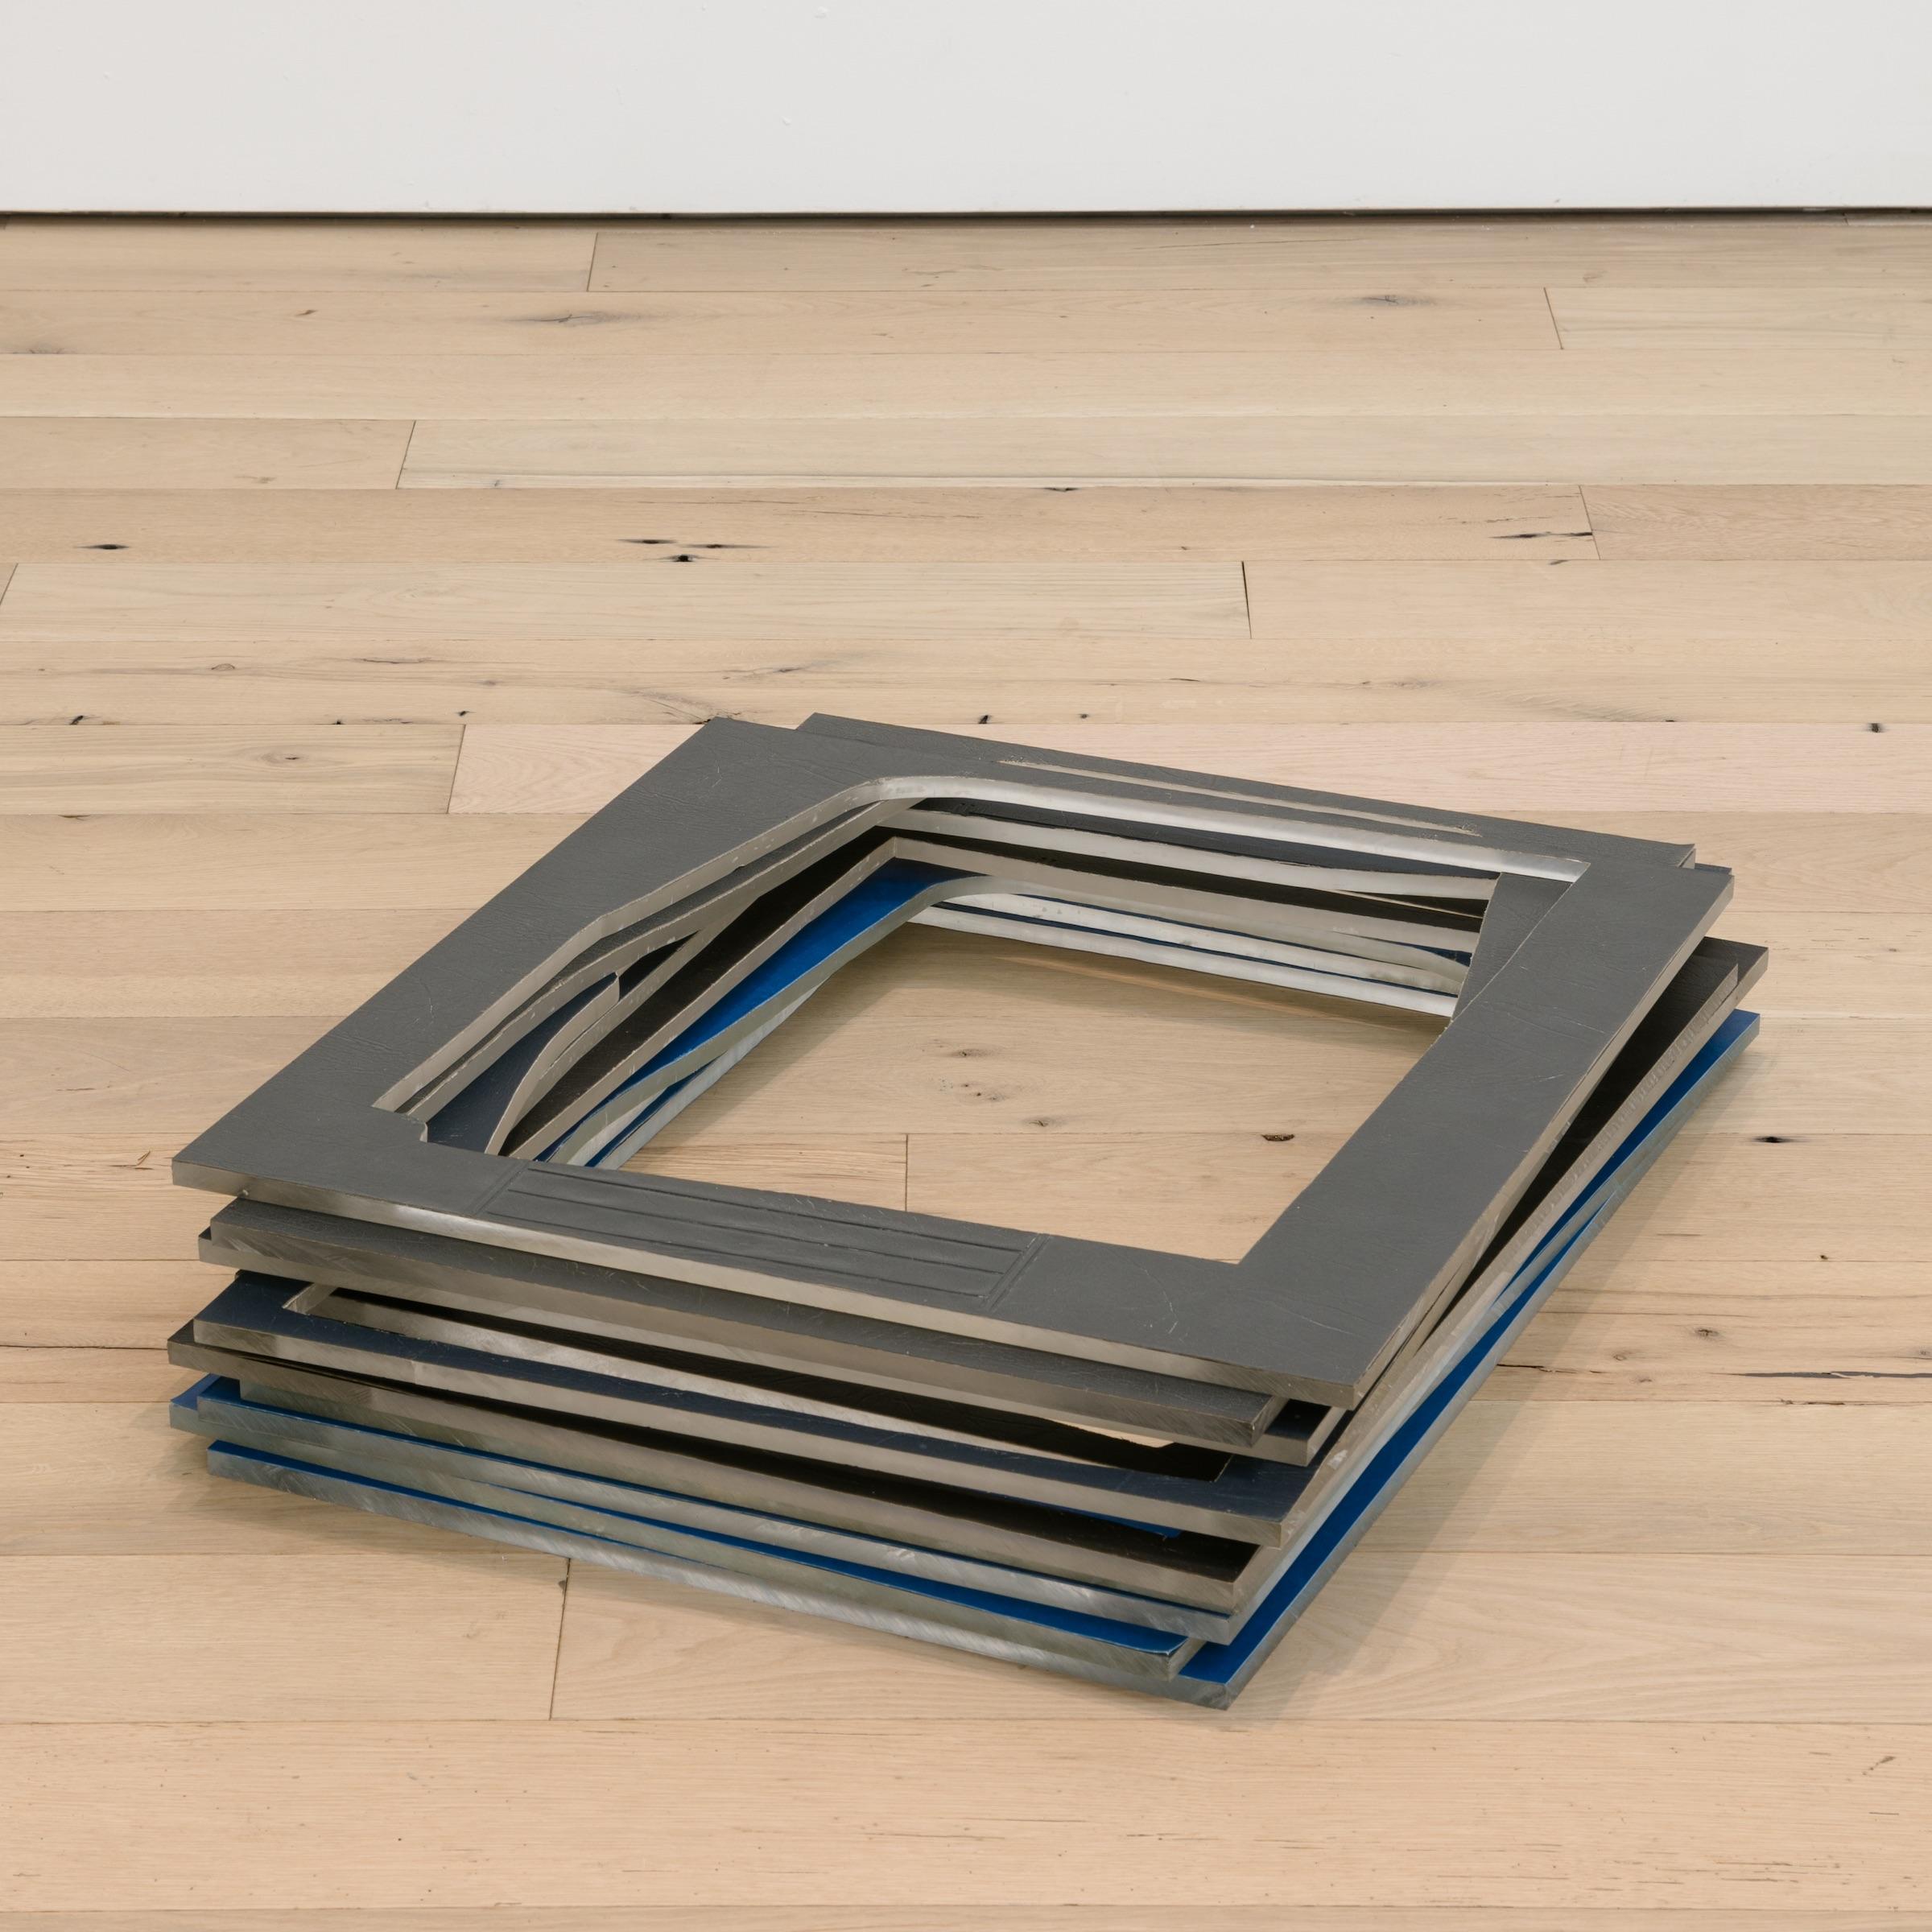 "Jessica Vaughn,  surplus   (2017), fabric scraps procured from manufacturer (09/2015-11/2016) on plexi, 29"" × 21 1/2"" × 1/2""; 25 1/2"" × 24 1/2"" × 1/2"" (framed); 32"" × 21 3/4"" (base)"